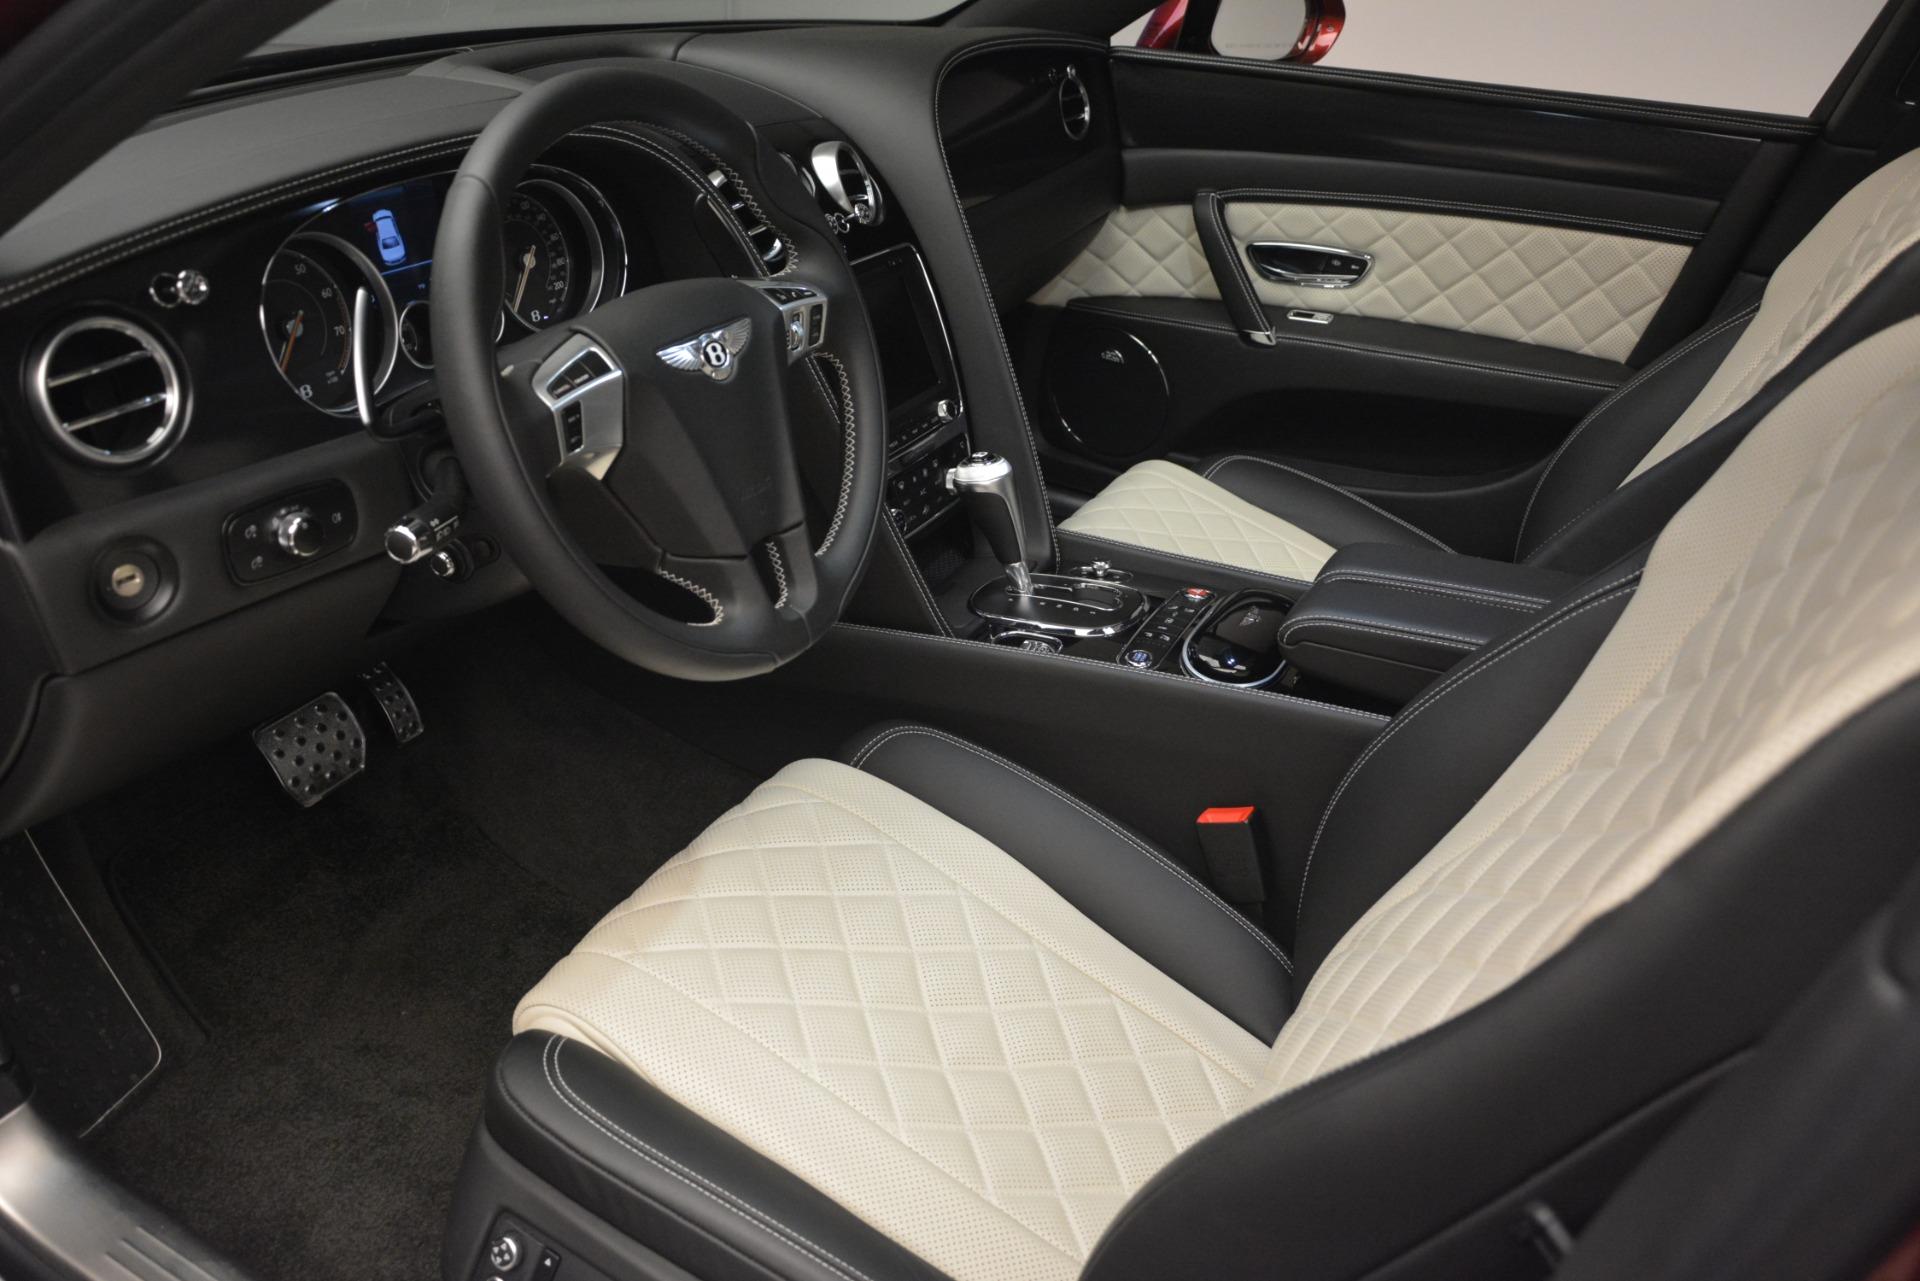 Used 2018 Bentley Flying Spur W12 S For Sale In Westport, CT 3014_p18